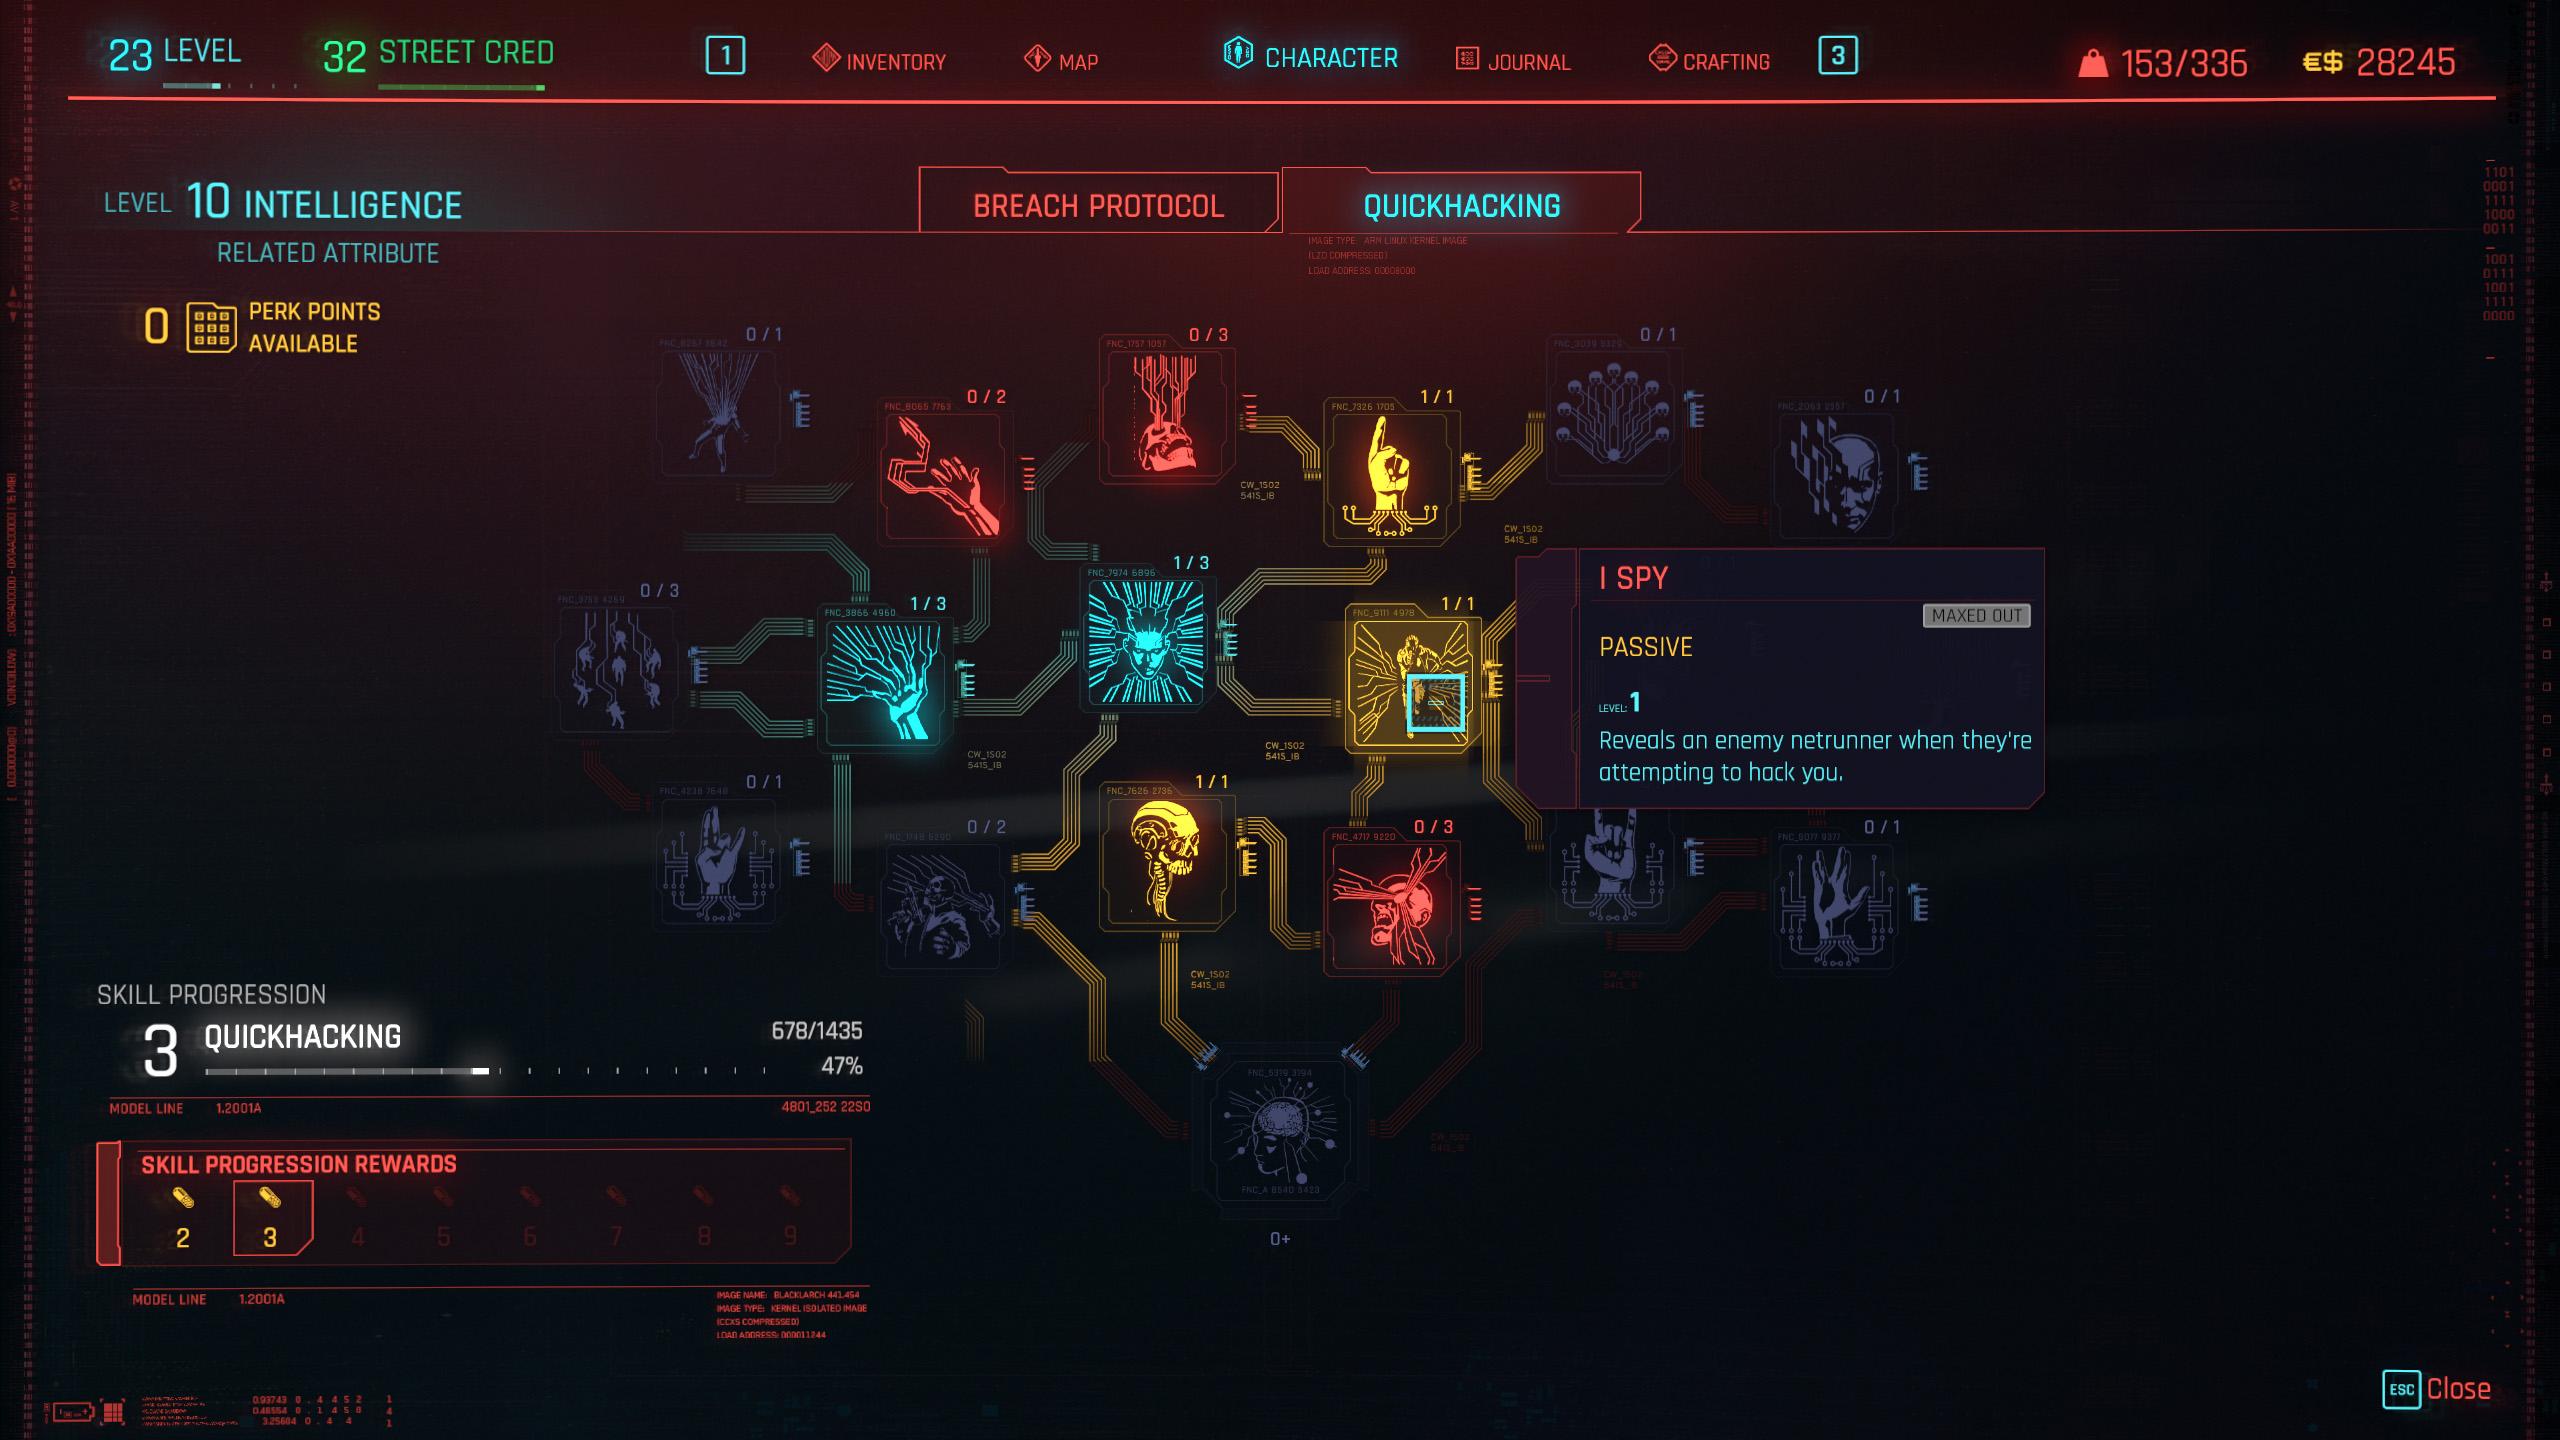 How to stop overheat - cyberpunk 2077